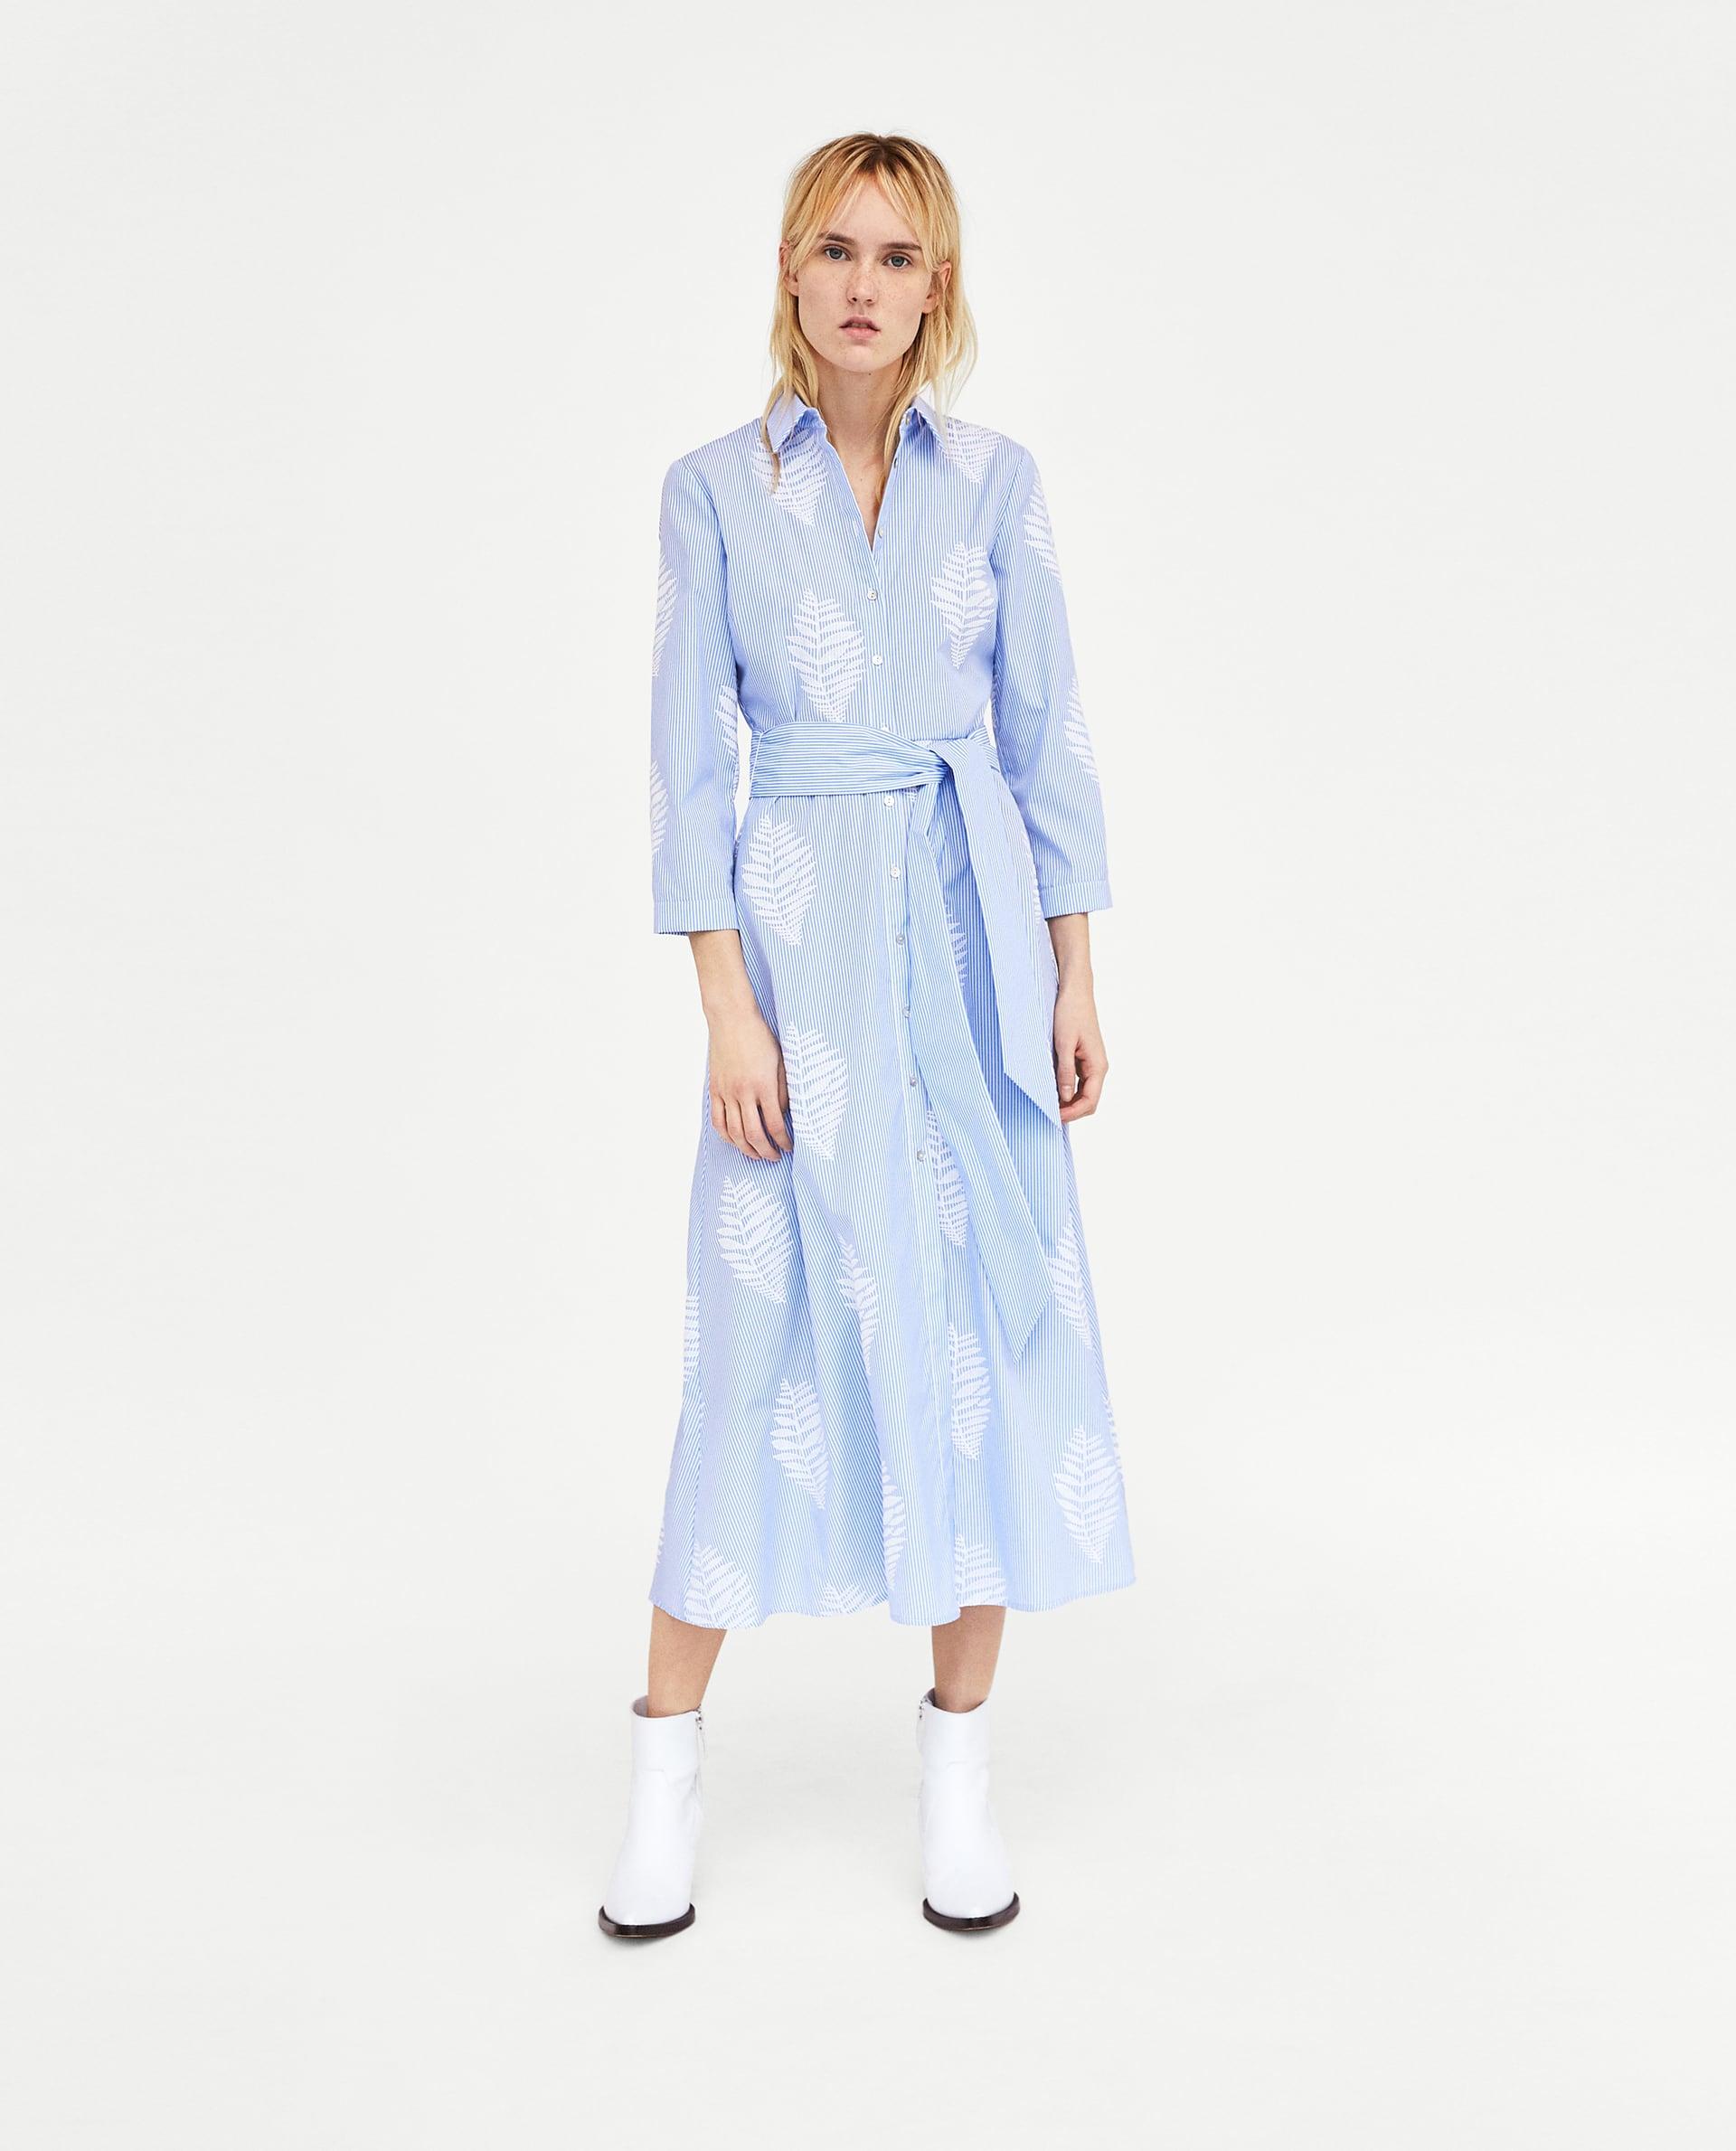 6060e46f410d Zara Midi Dress Trend Dresses For Women